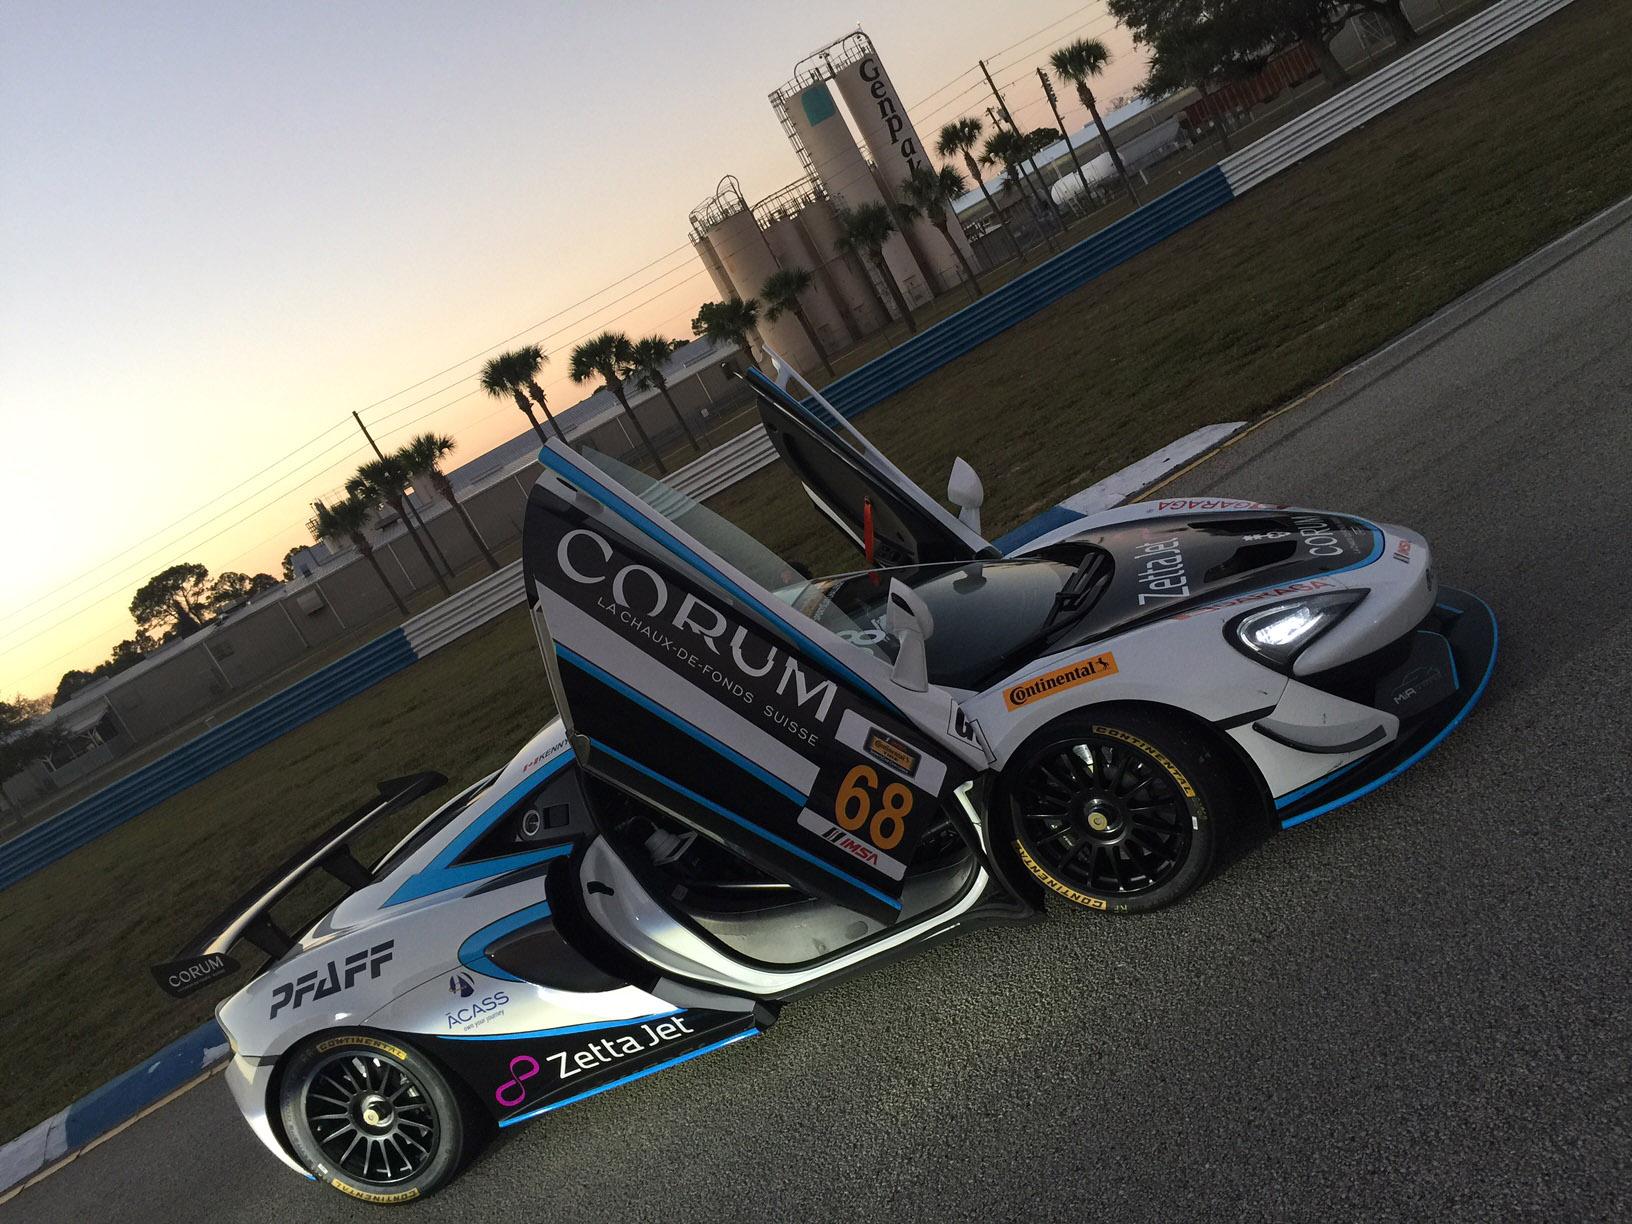 Corum Watches And Zetta Jet McLaren GT4s For The Motorsports In Action Team!